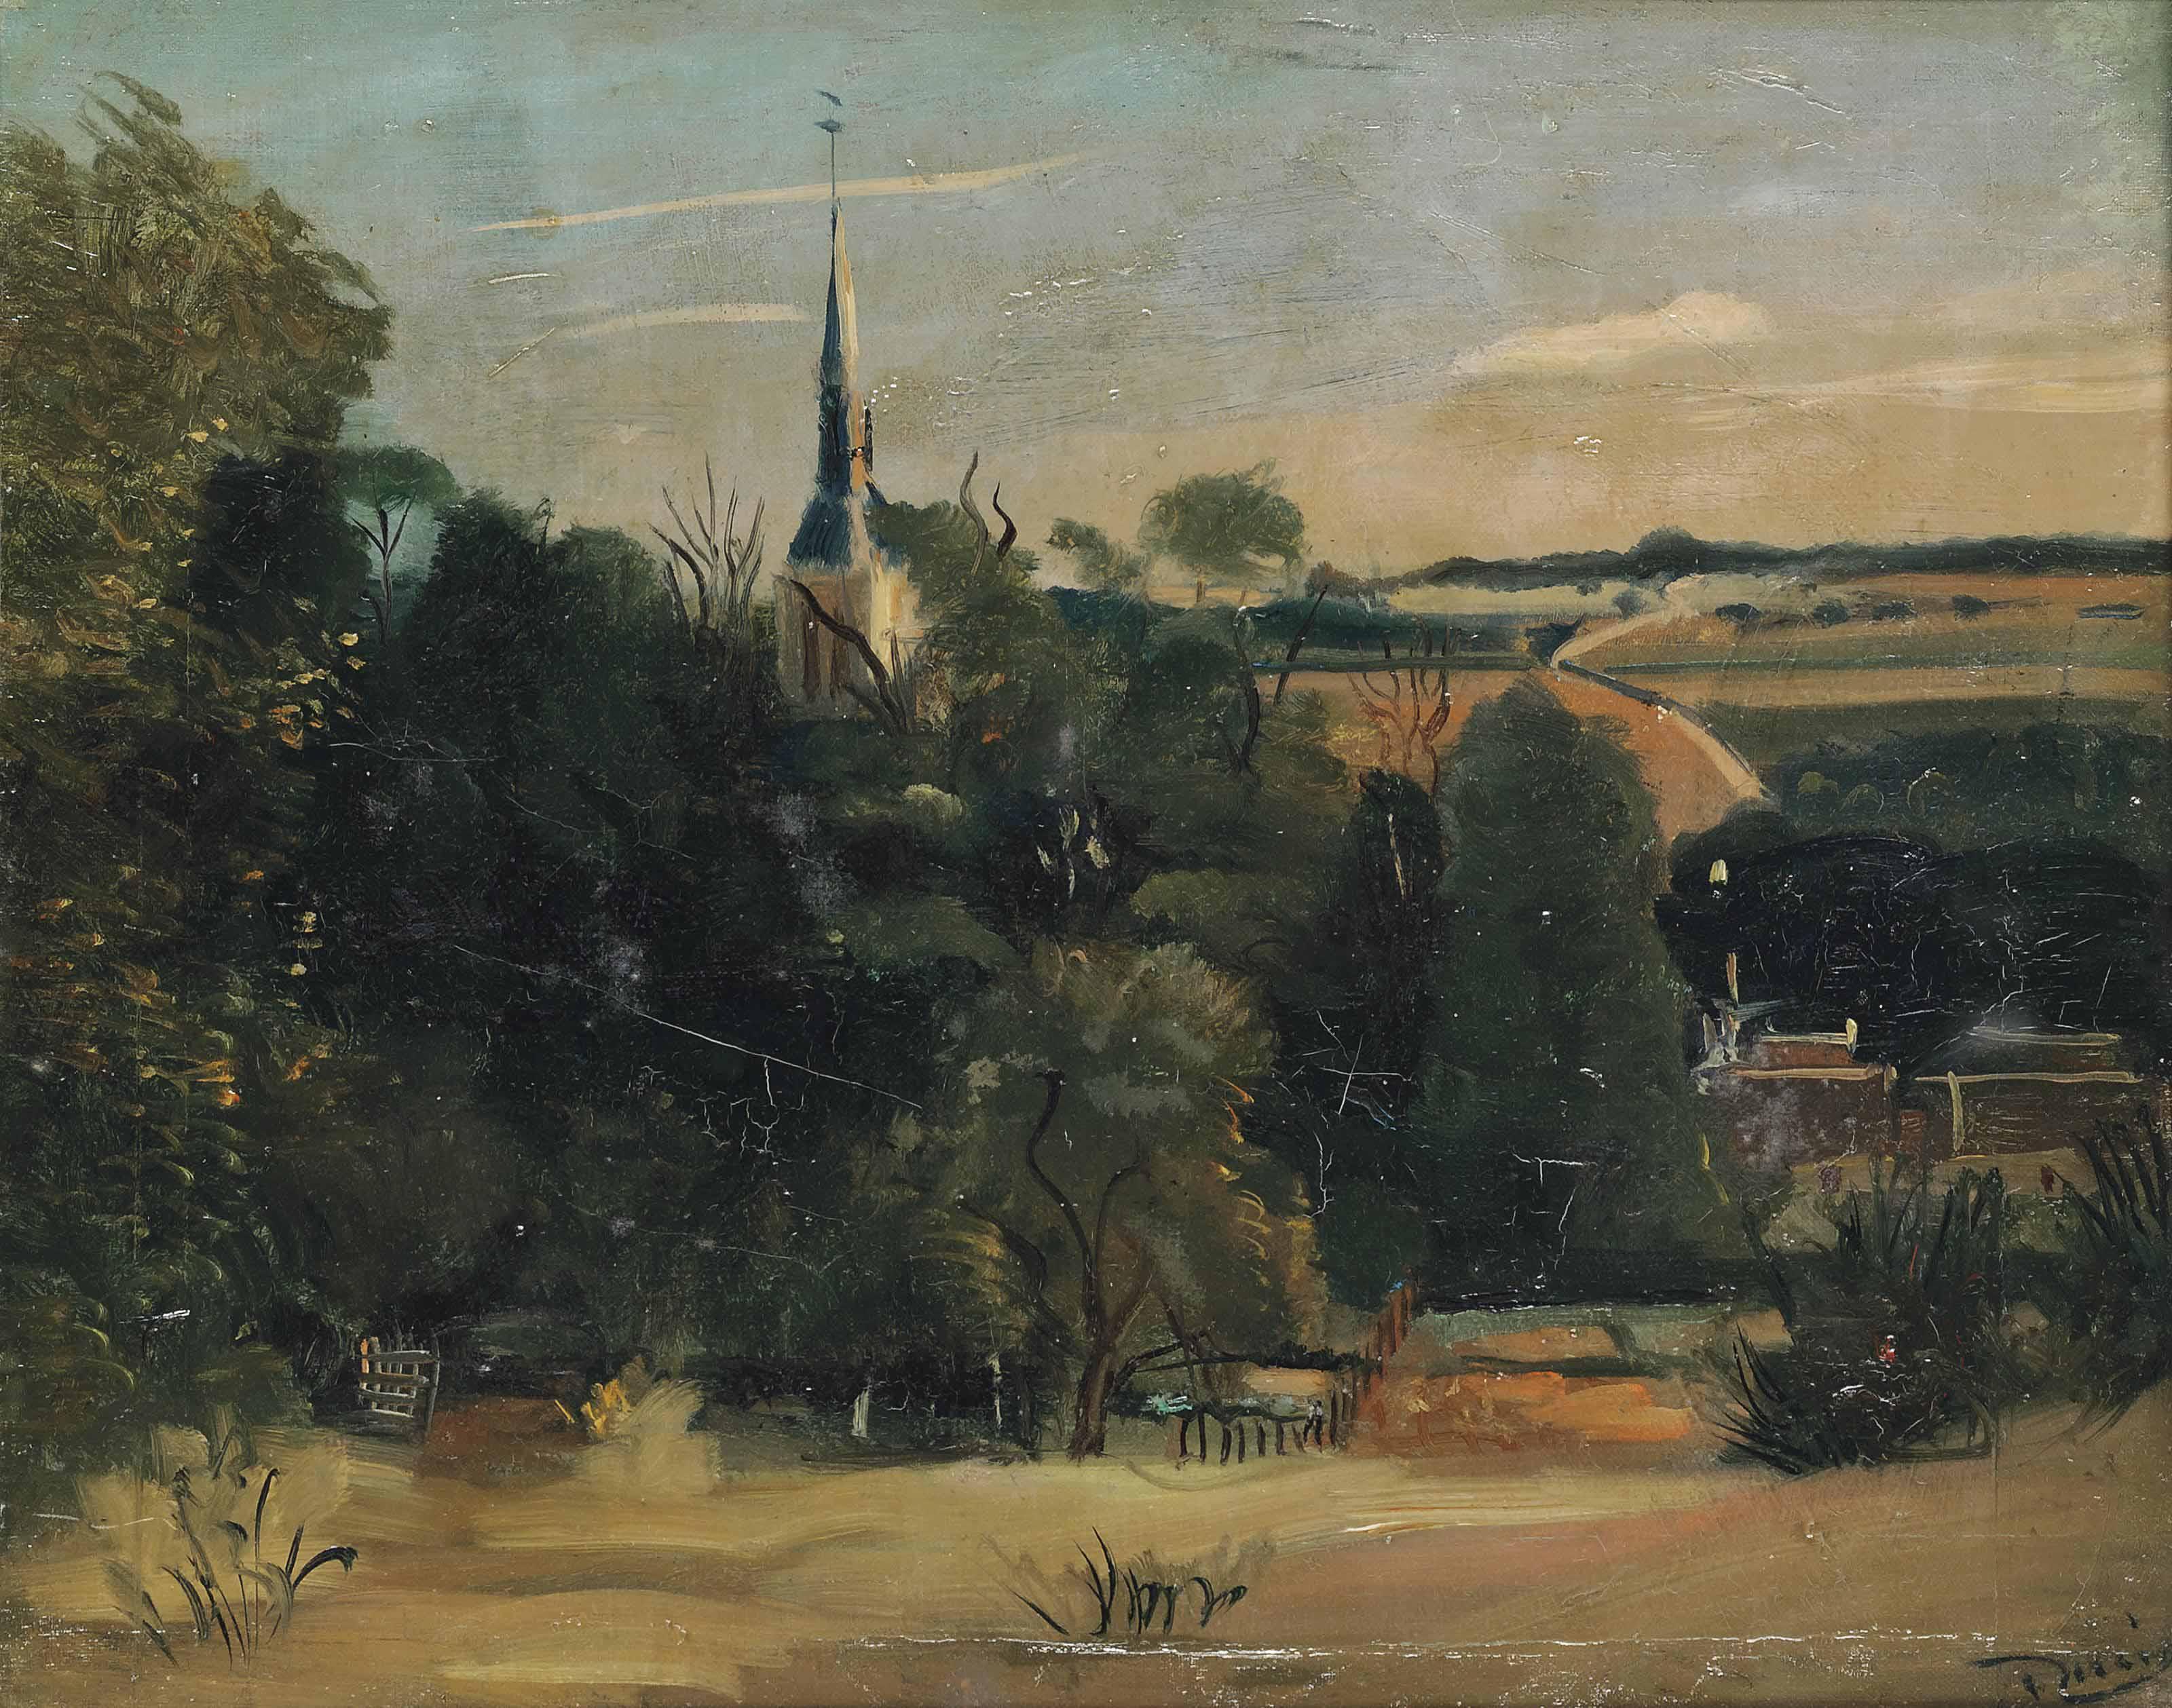 André Derain (1880-1954)